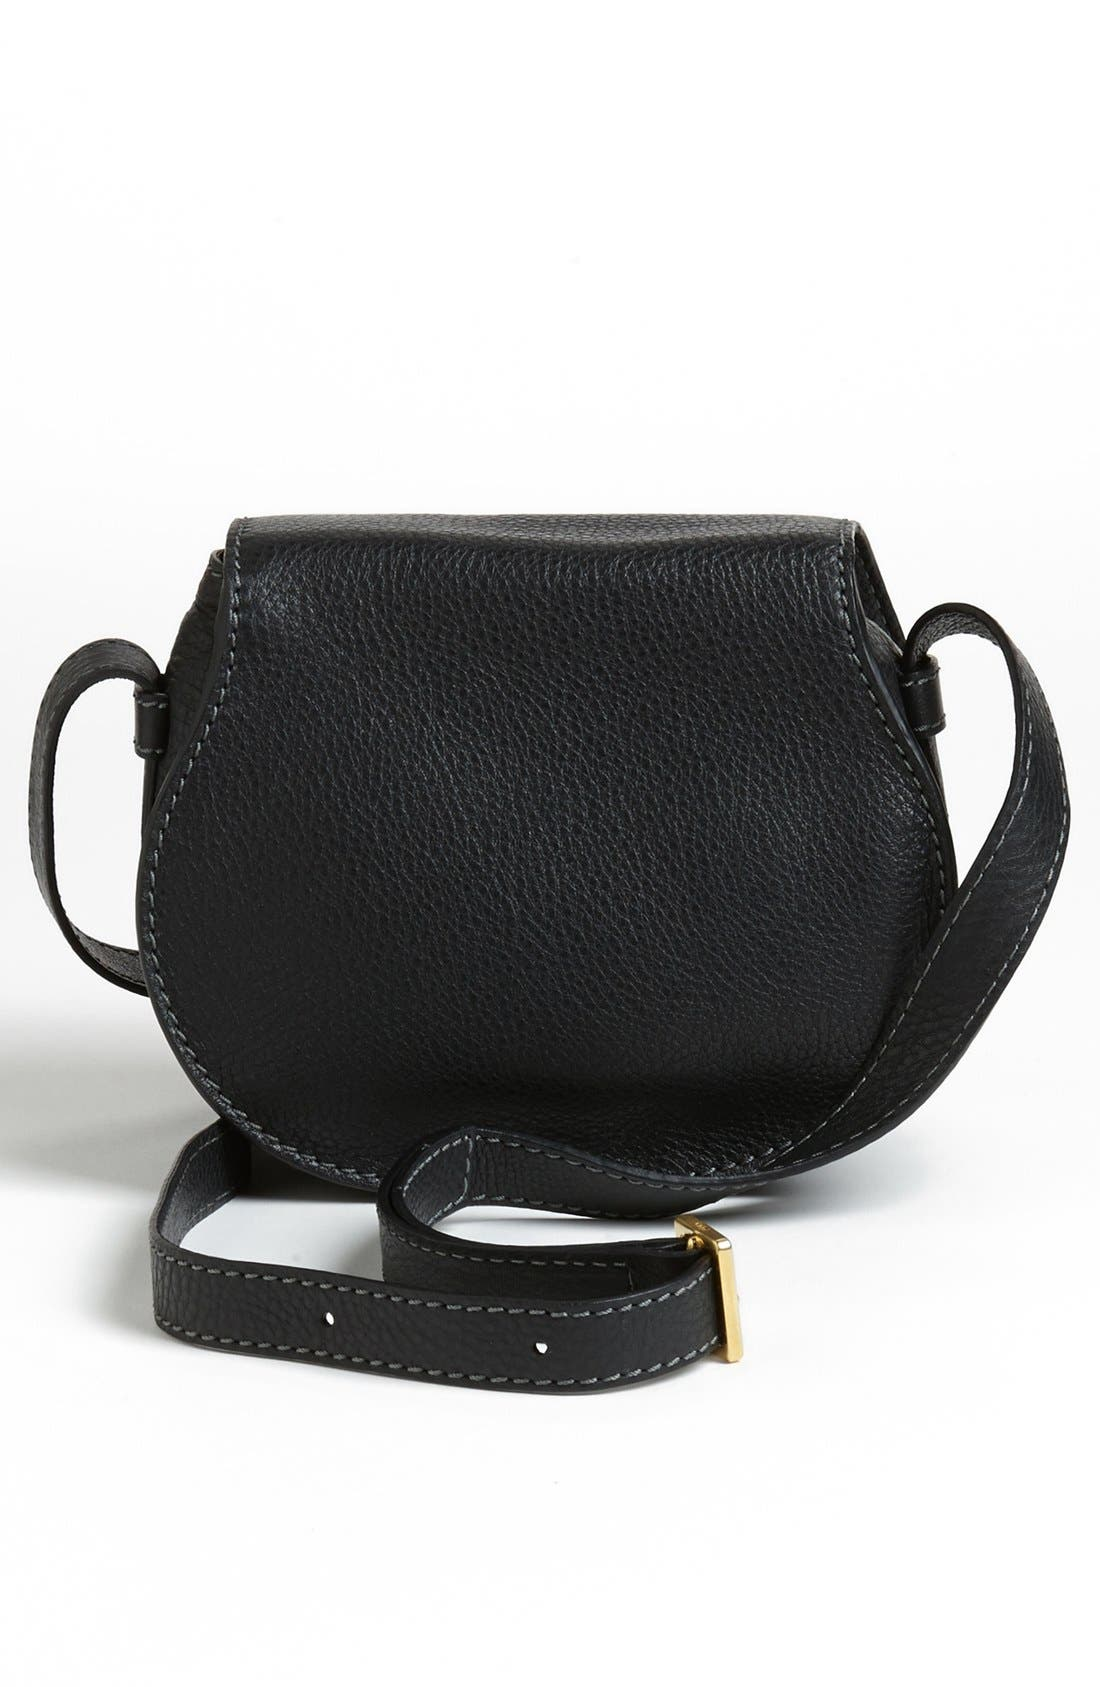 Alternate Image 3  - Chloé 'Mini Marcie' Leather Crossbody Bag